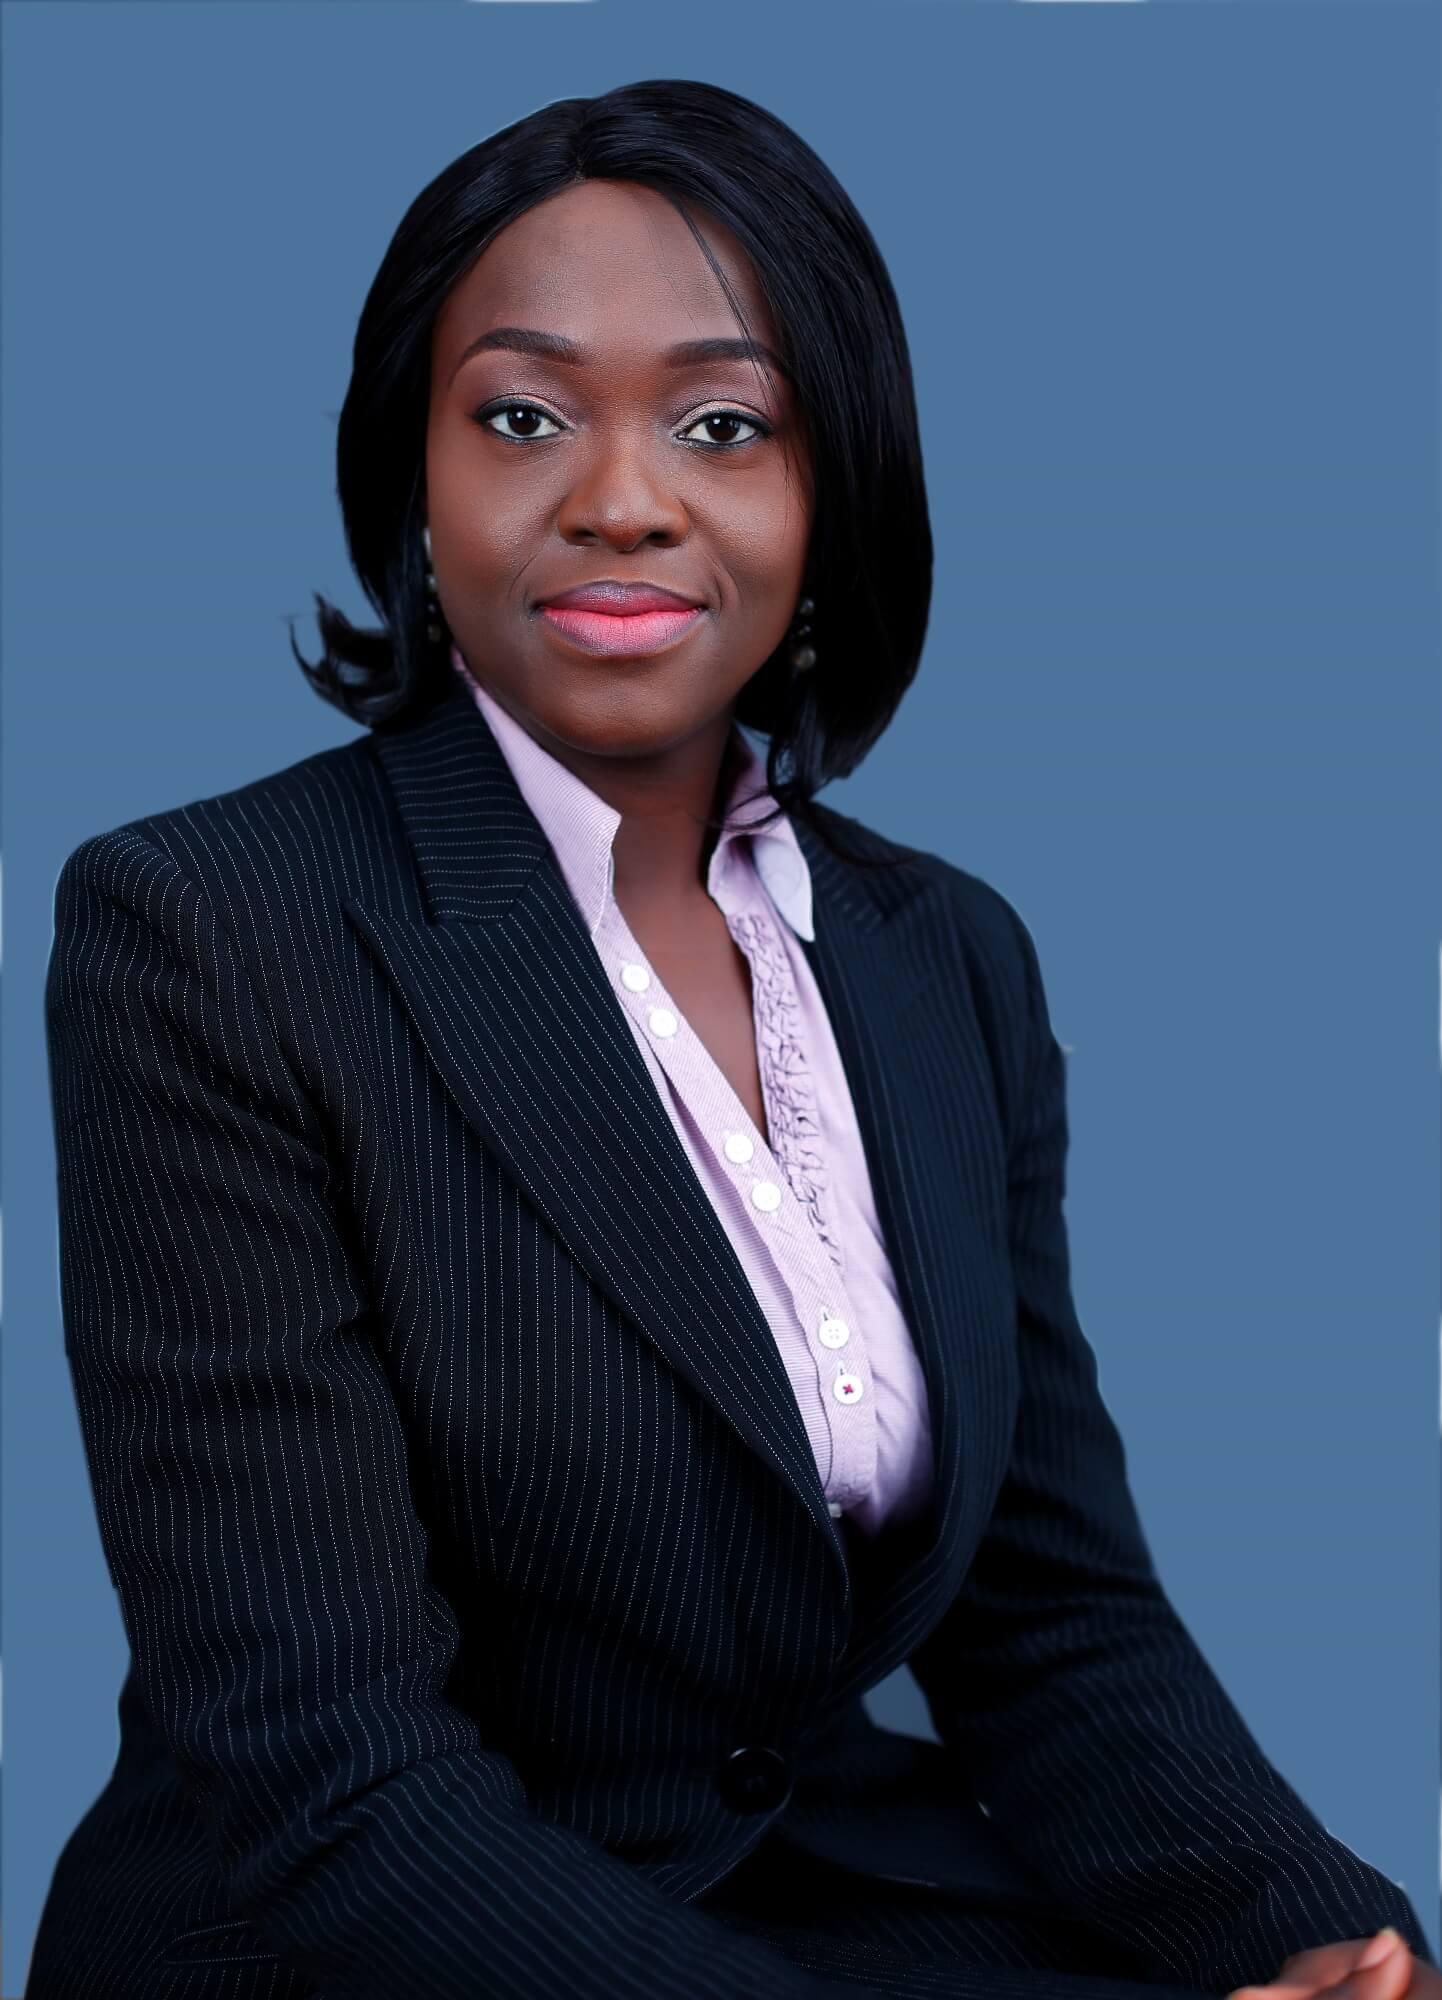 Nigeria site de rencontre au Royaume-Uni SMS site de rencontre